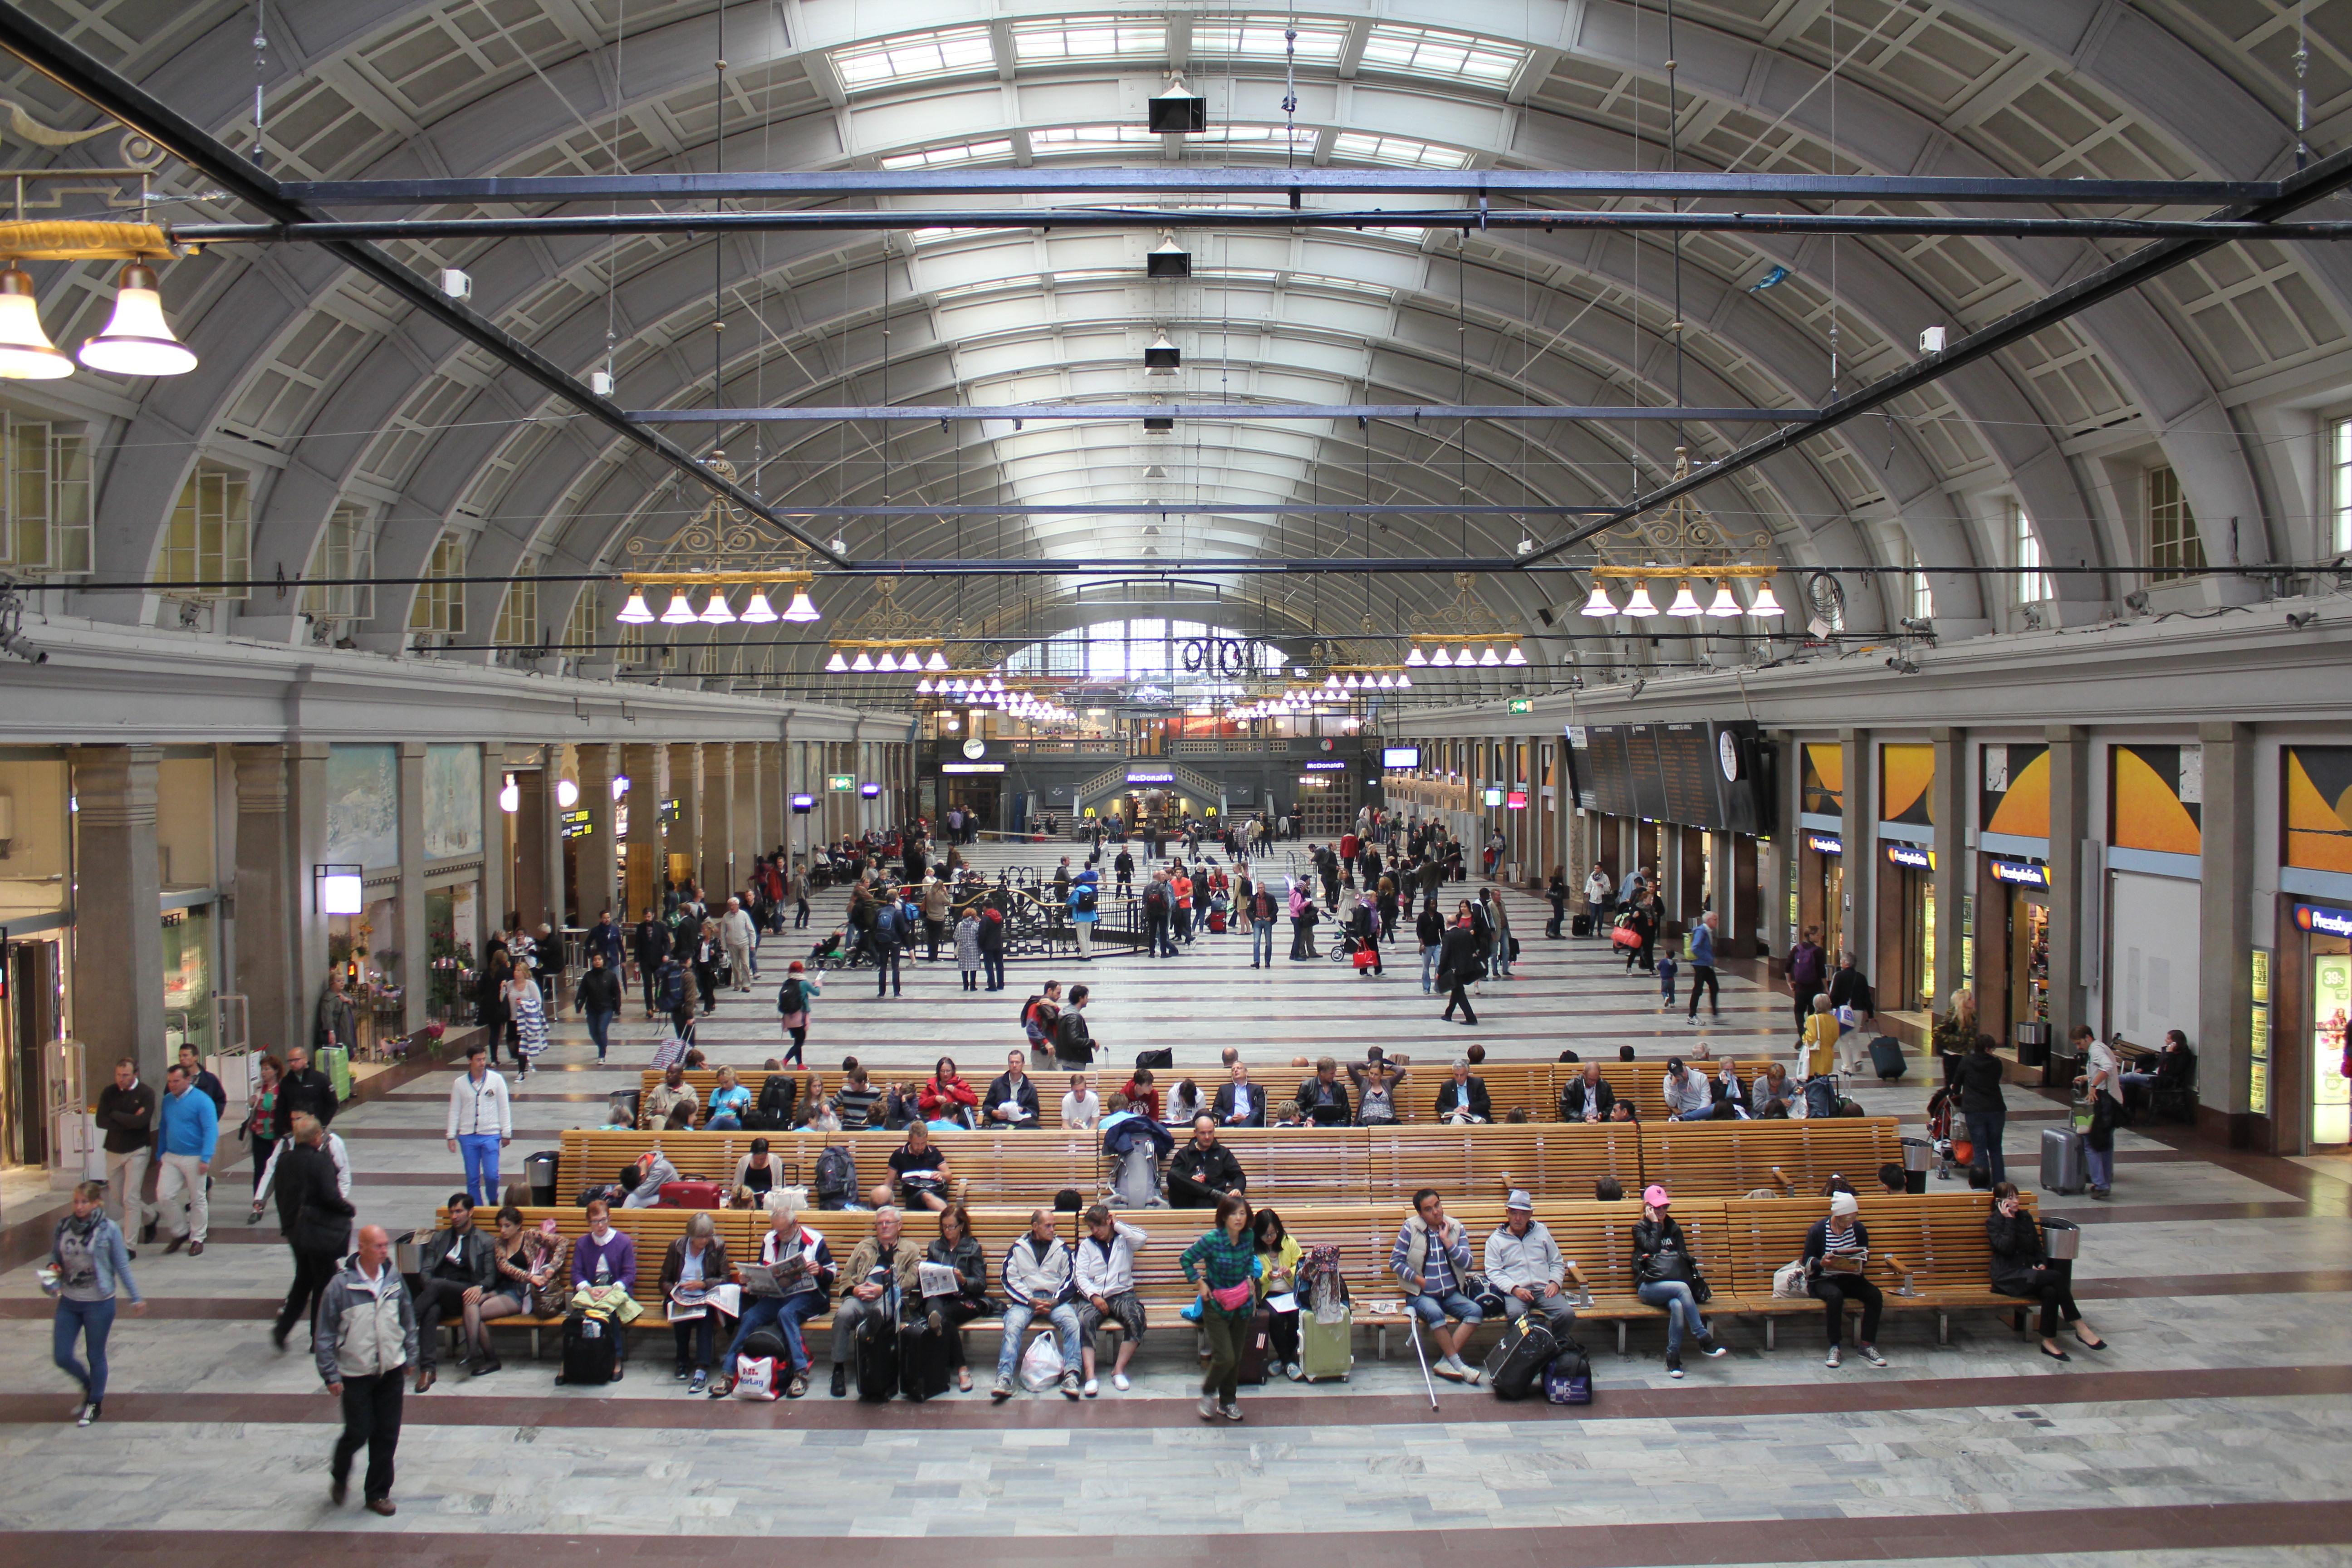 Urban Interior Design File Stockholms Centralstation Interi 246 R Jpg Wikimedia